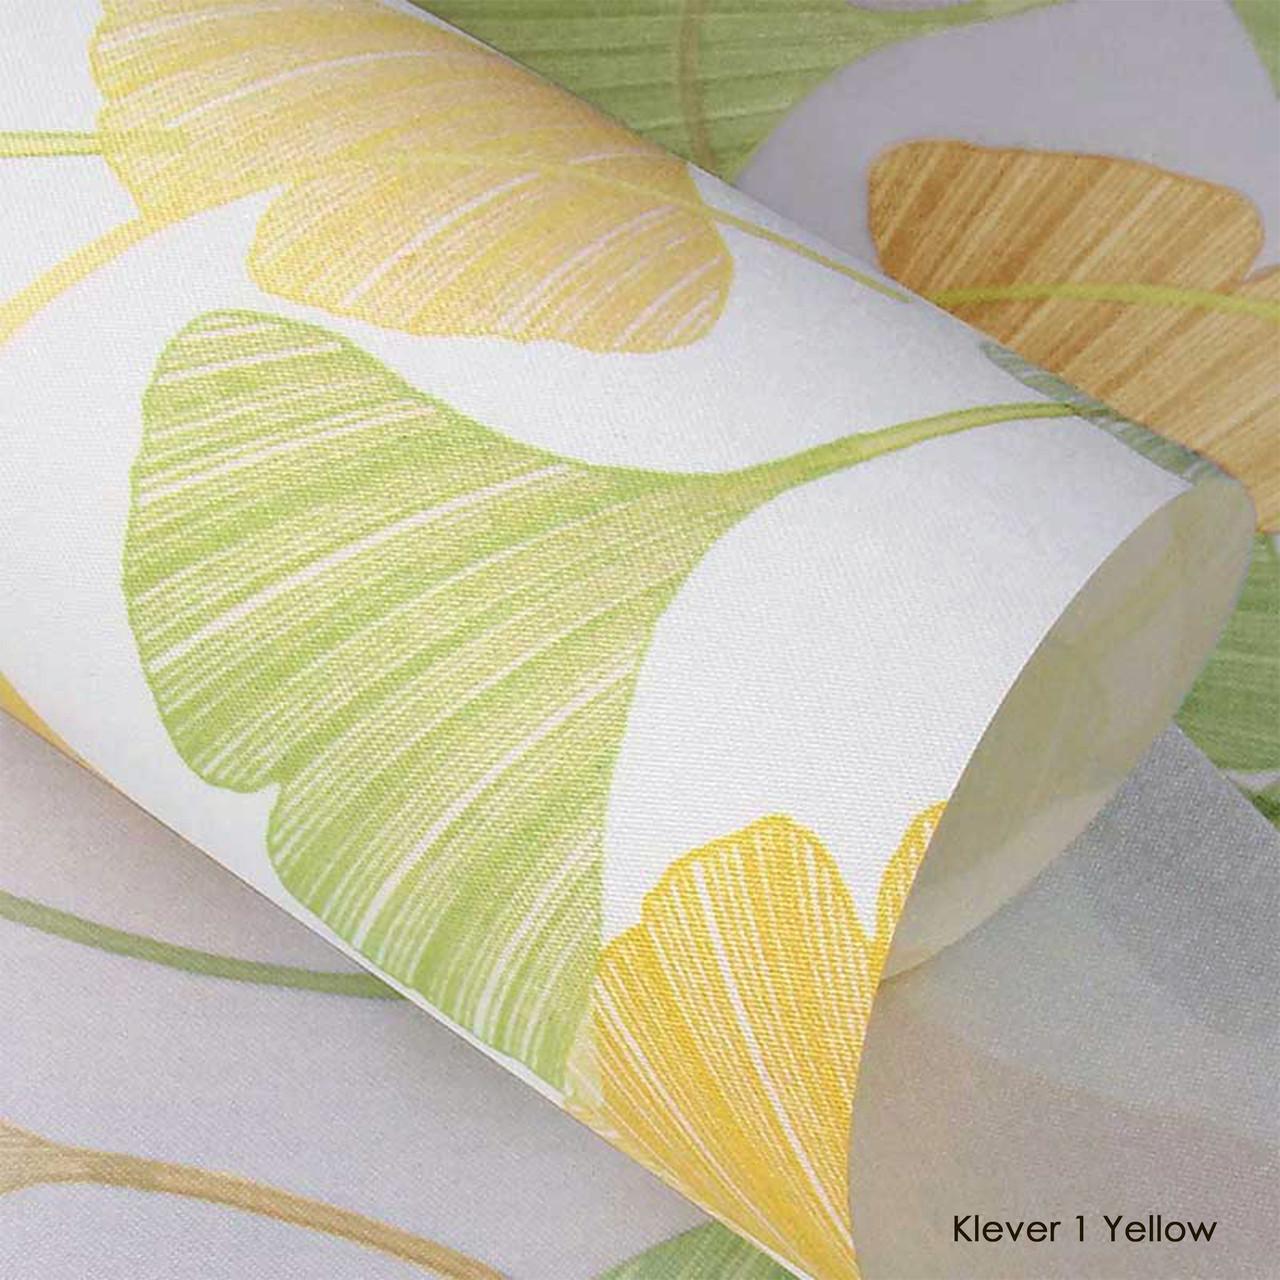 Ролеты тканевые Klever 1 Yellow